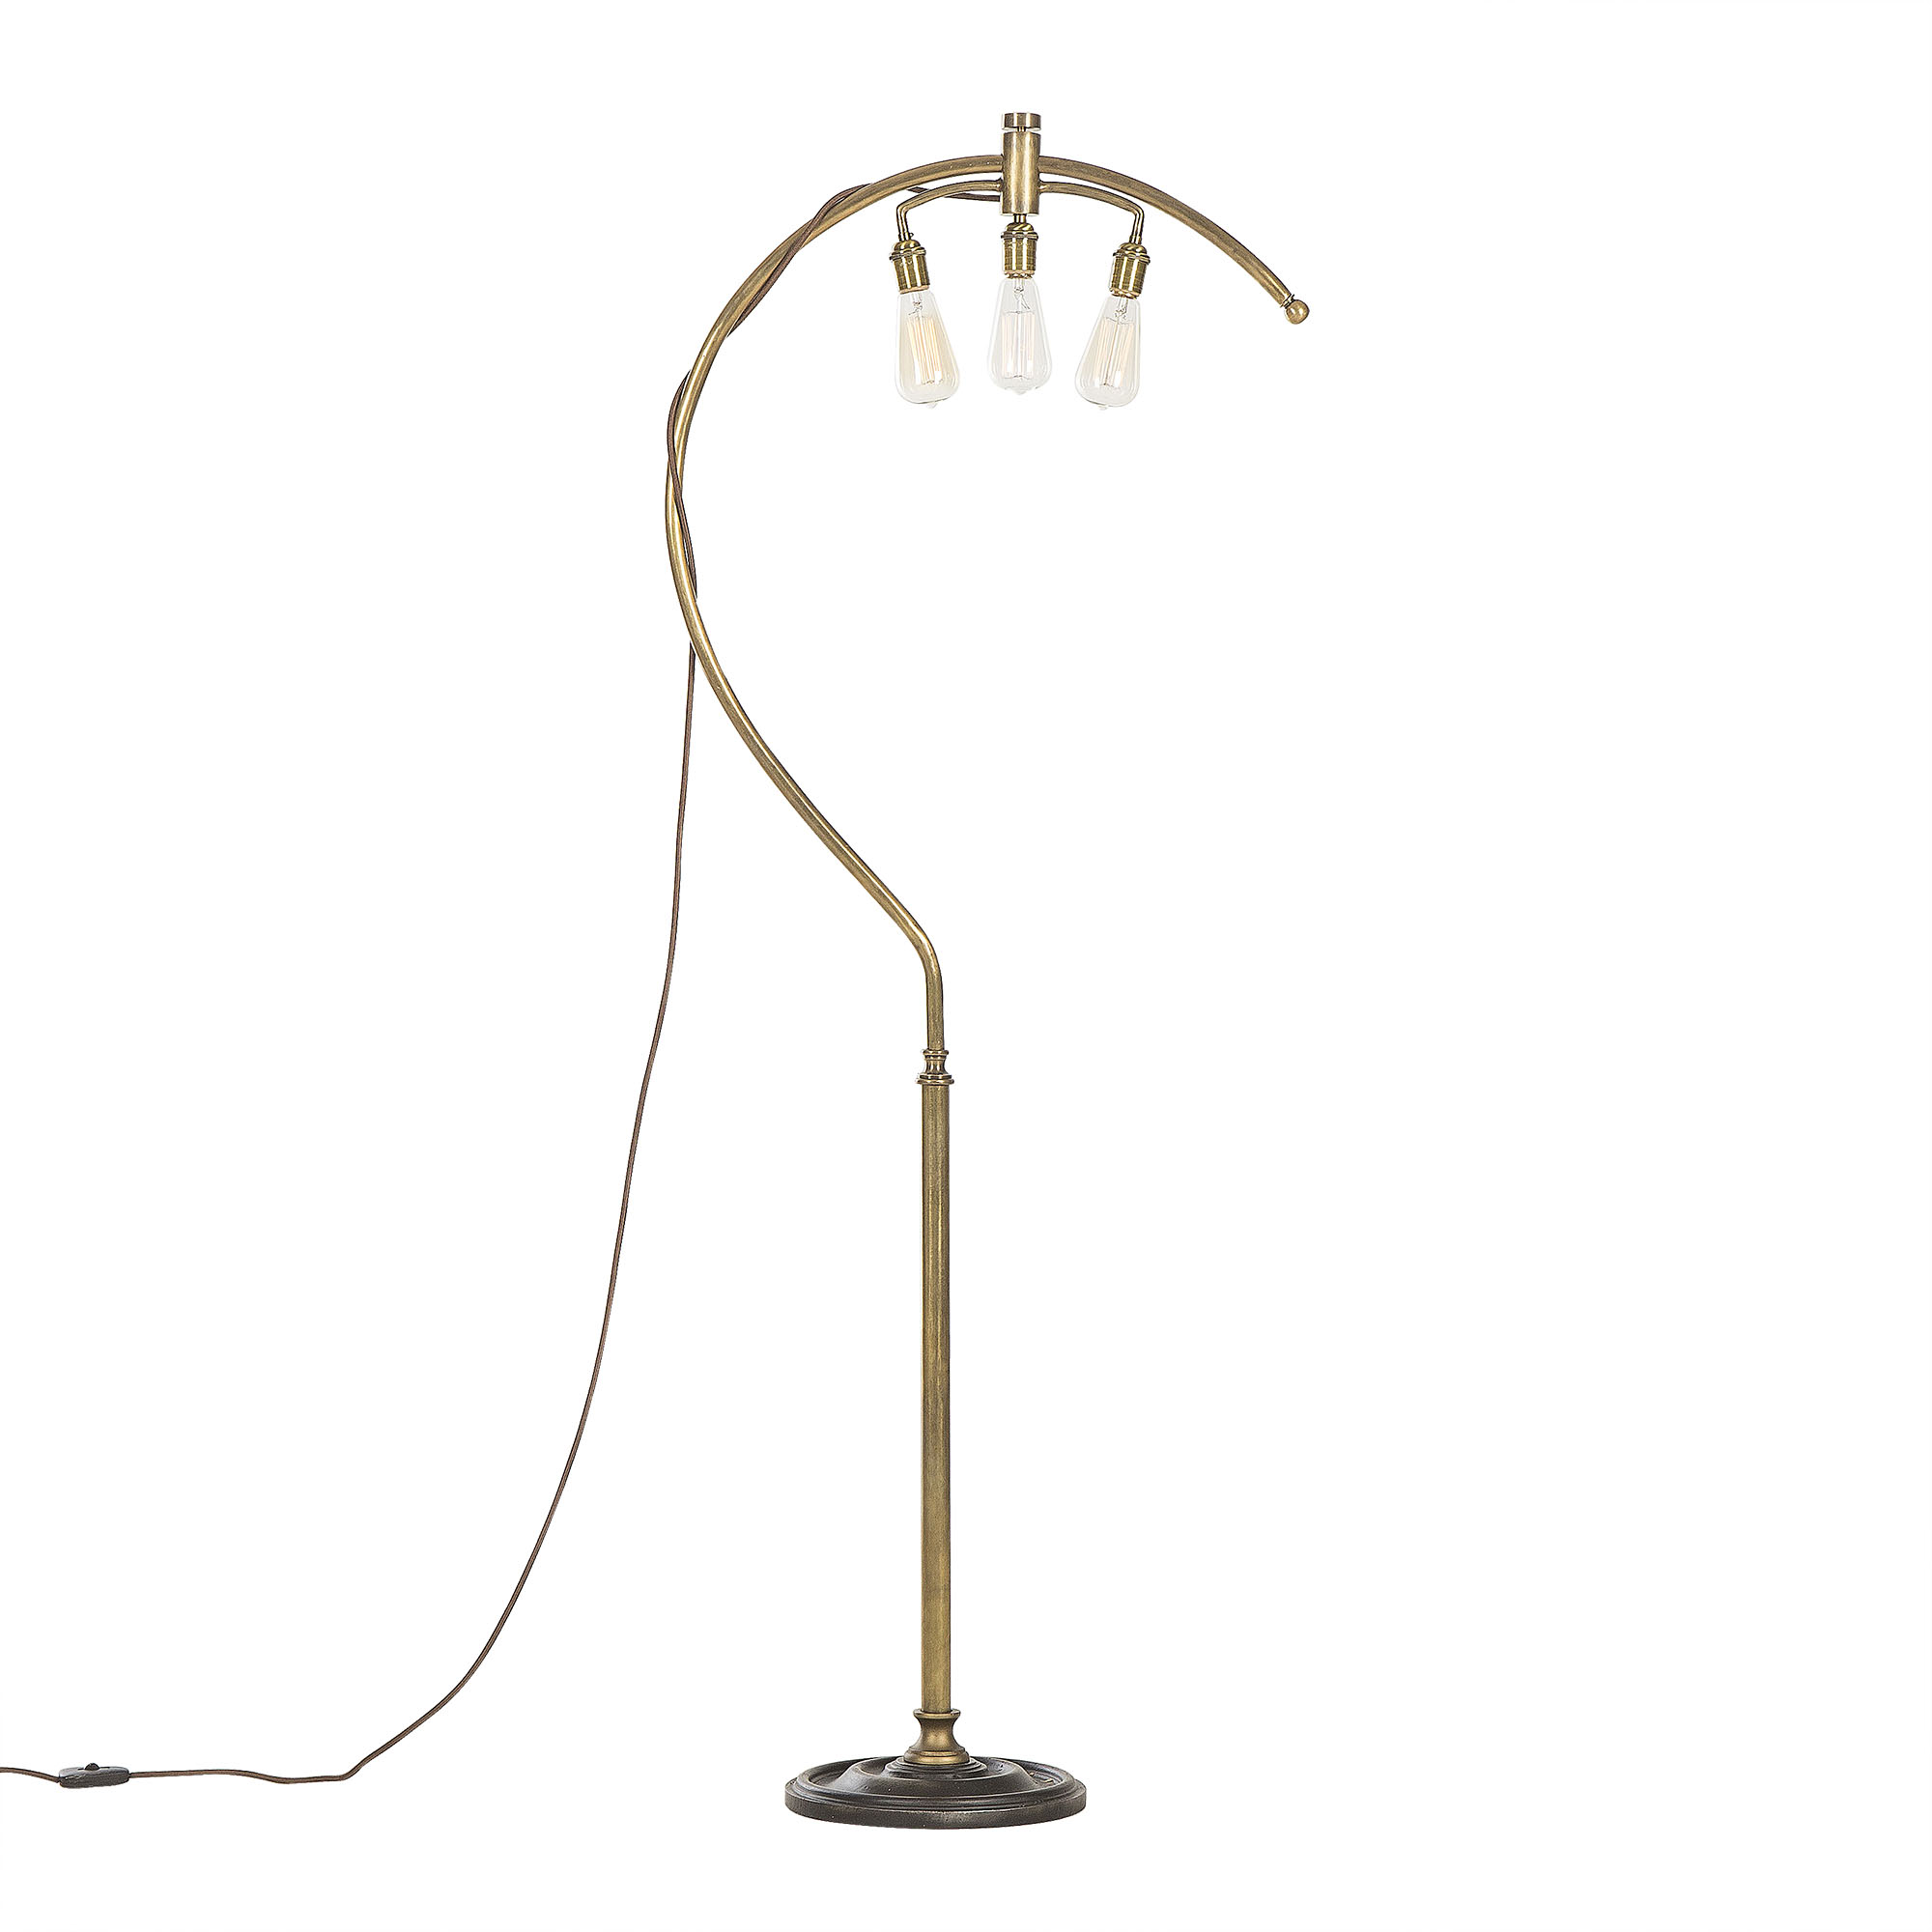 LI063F01 Cartogrpaher Floor Lamp 1.jpg